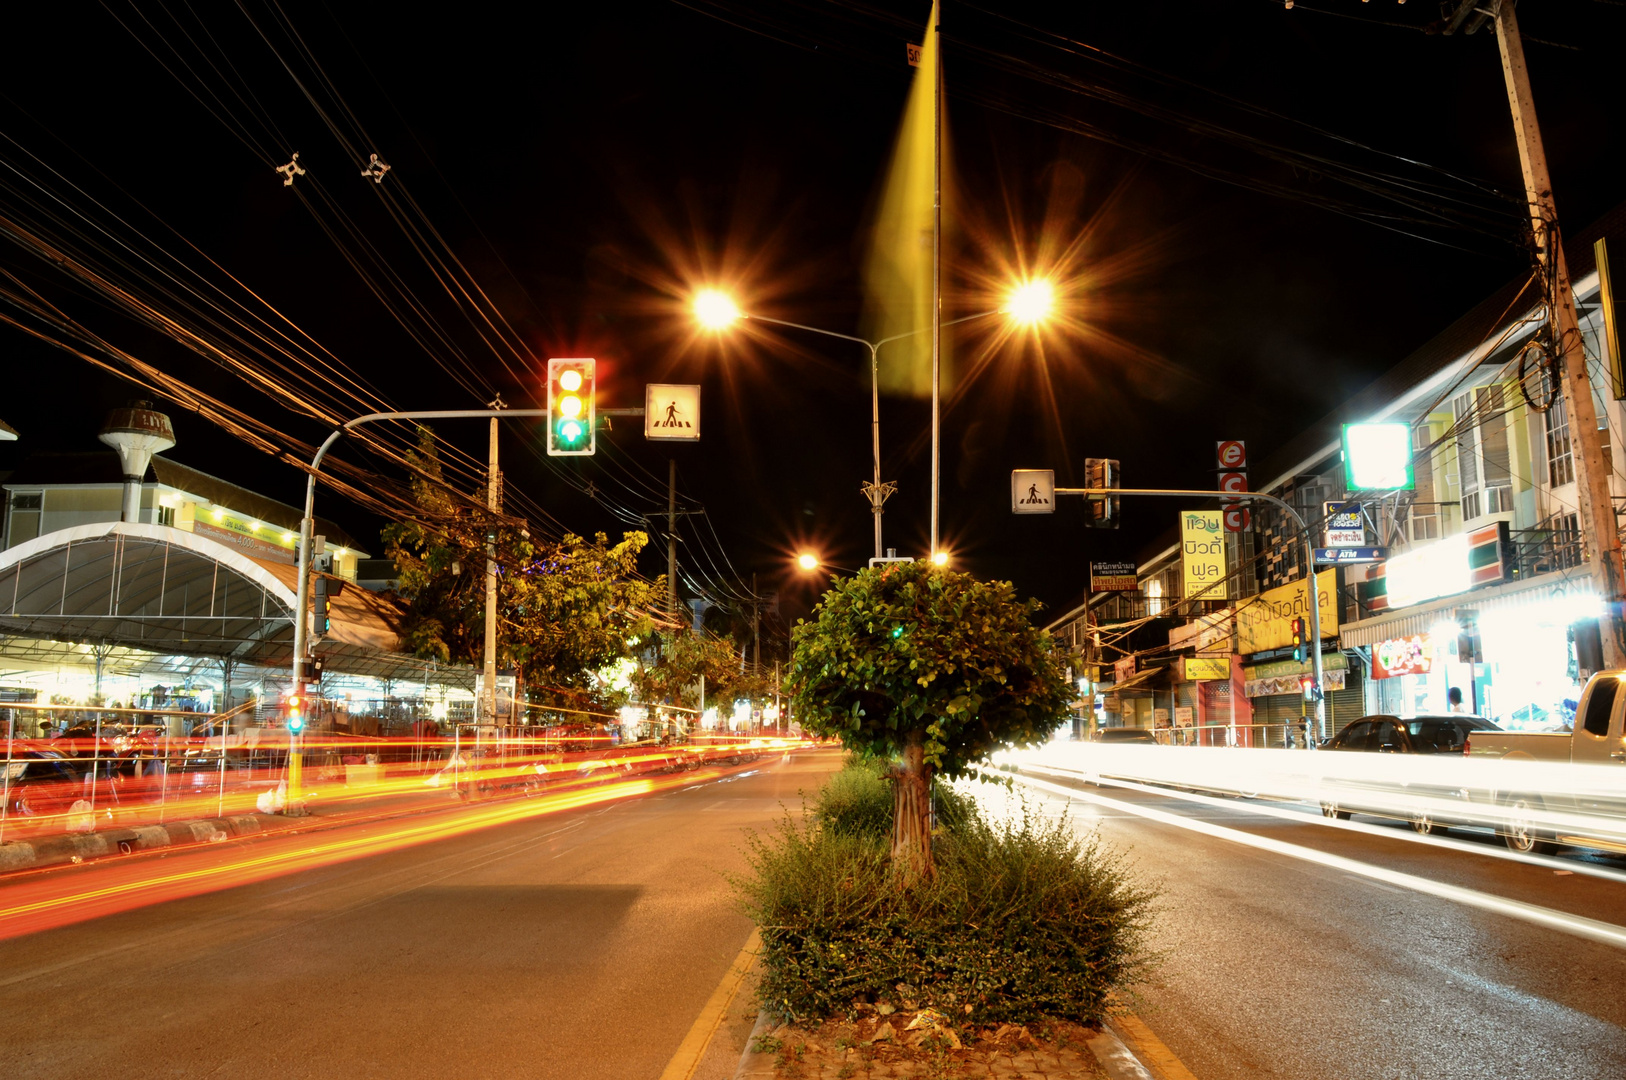 Street of Thailand